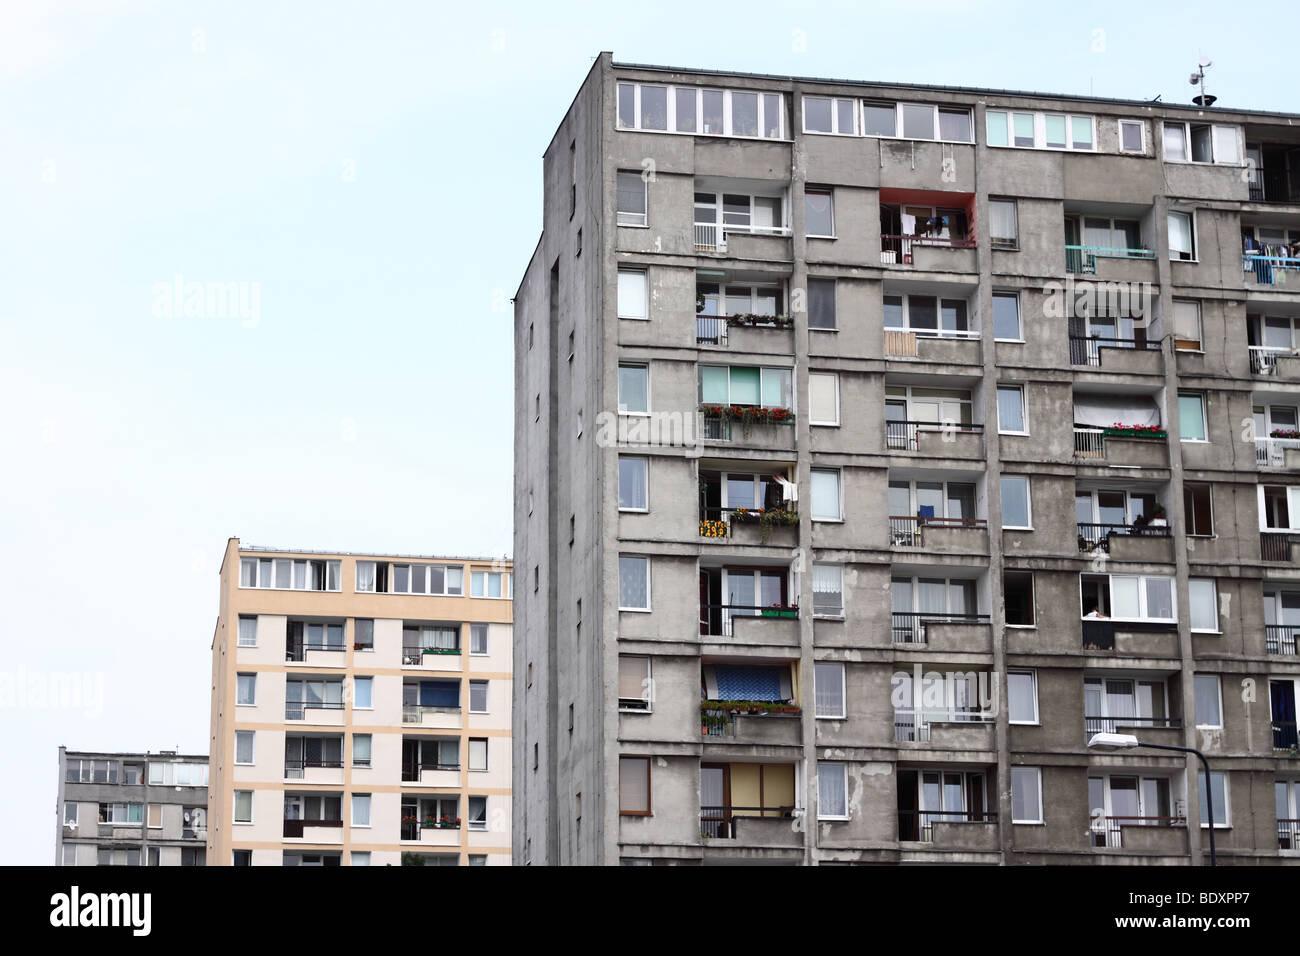 Warsaw Poland old style communist era public housing concrete flats note renovated bloc behind taken Summer 2009 - Stock Image